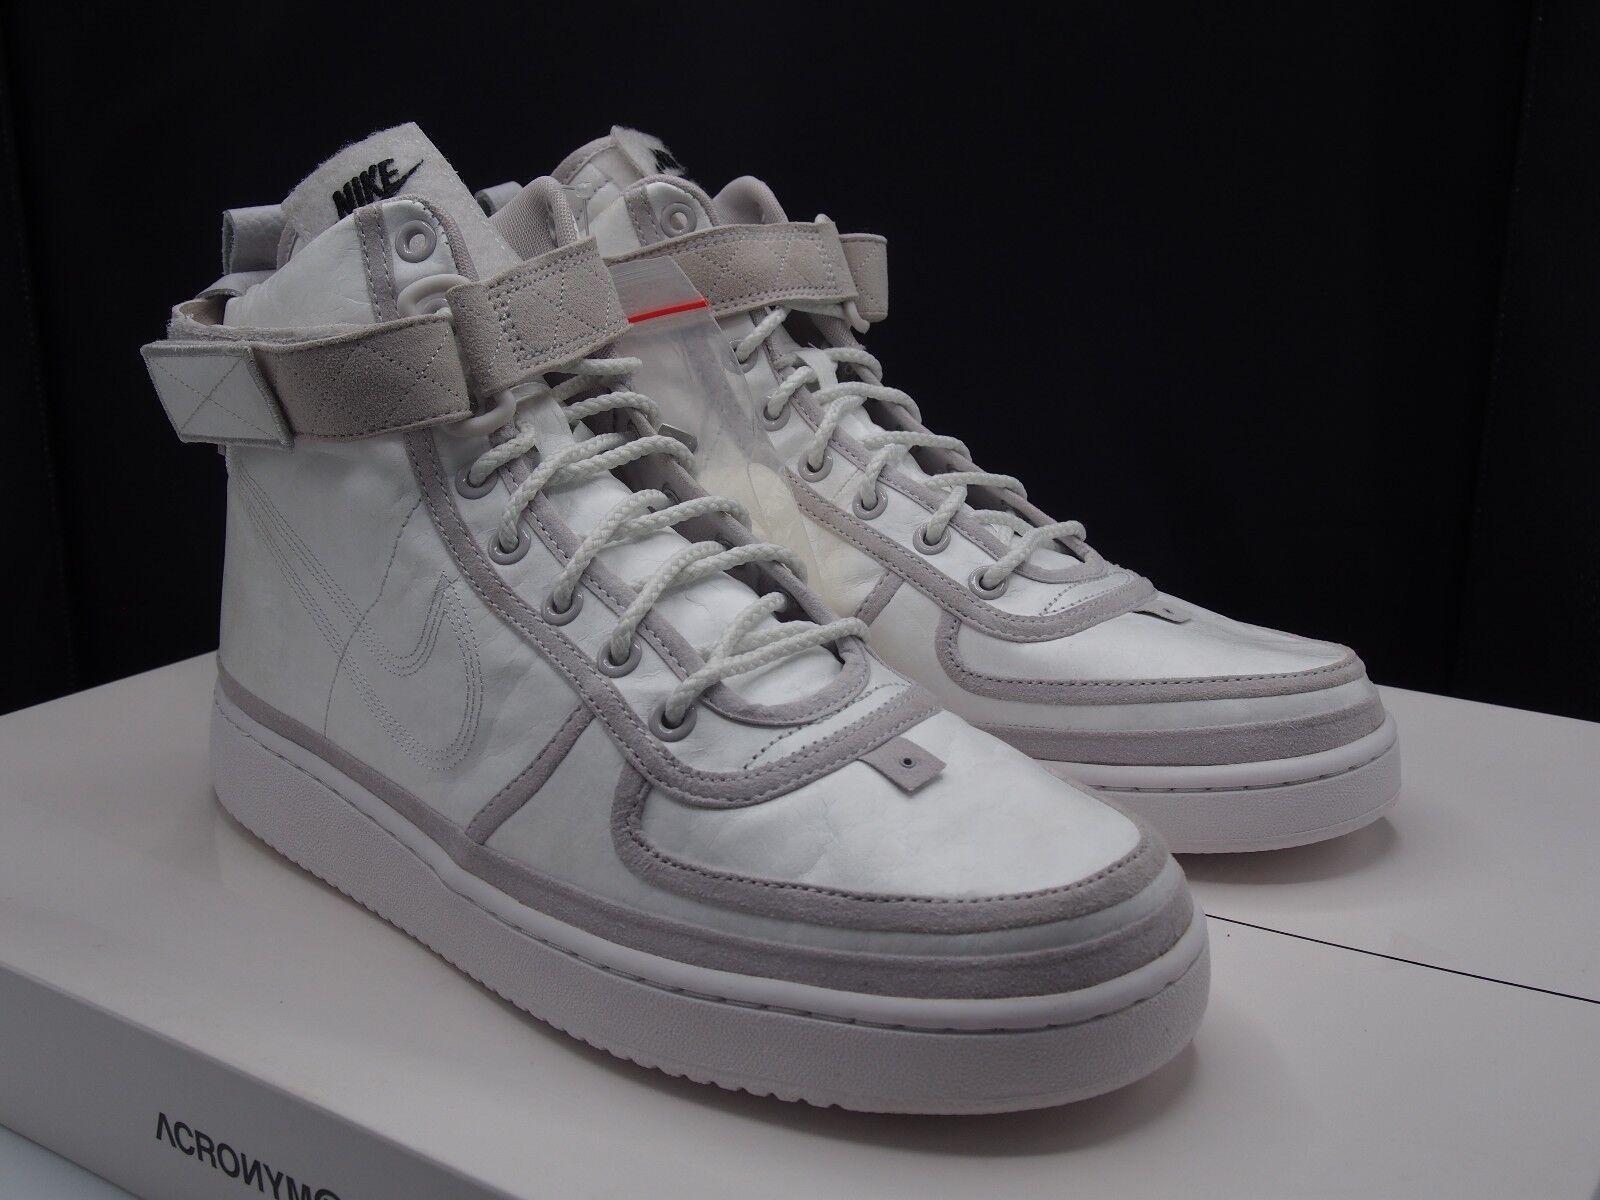 Nike Vandal High Supreme QS All-Star Customizable AQ0113-001